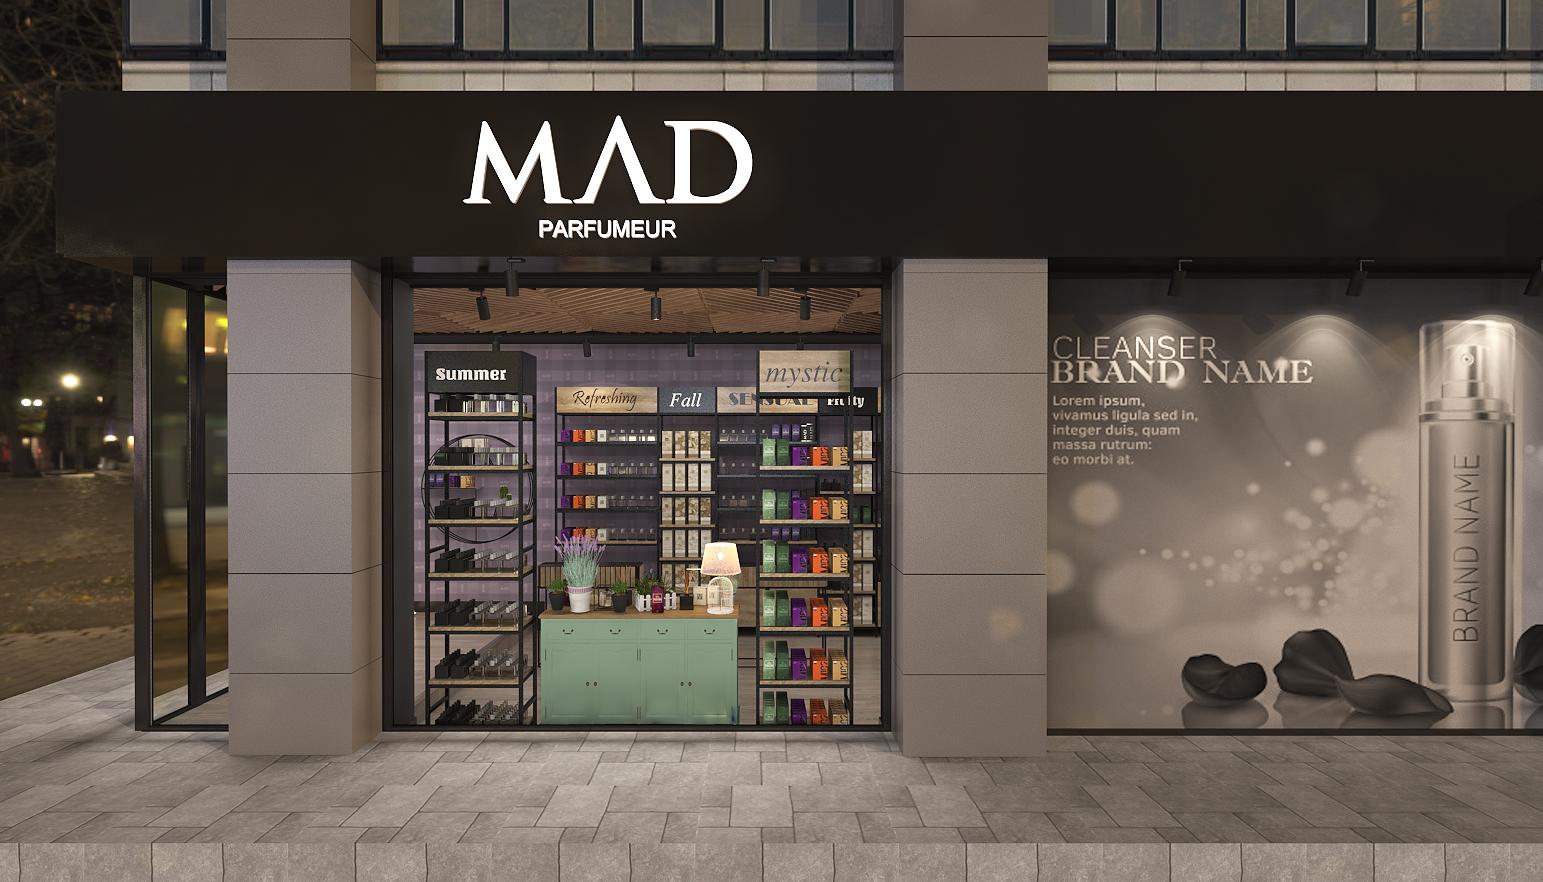 Hotel Architecture and Interior Design Mad Parfumer Store